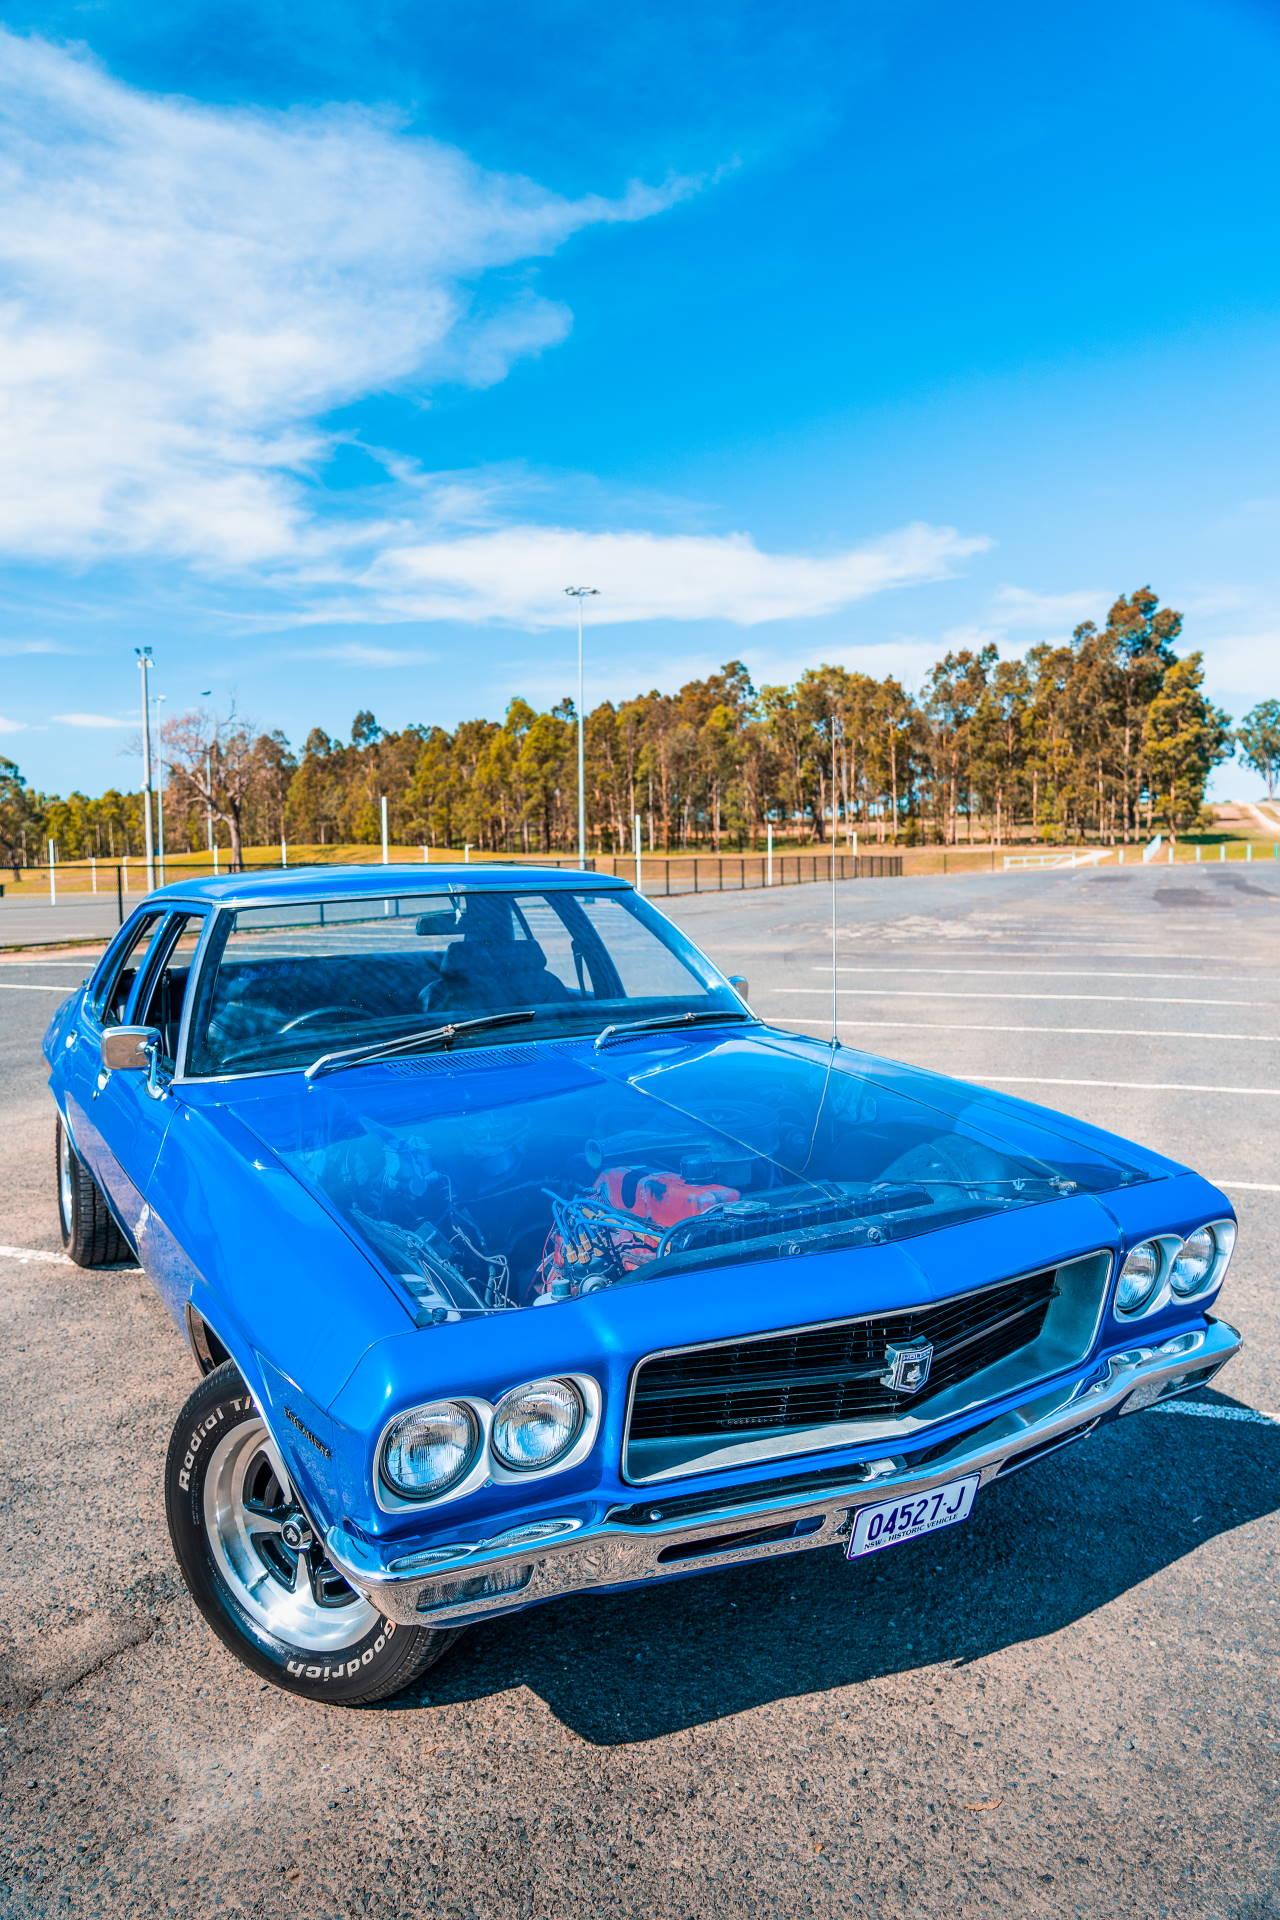 1972 Holden HQ Premier Sedan - Rear View